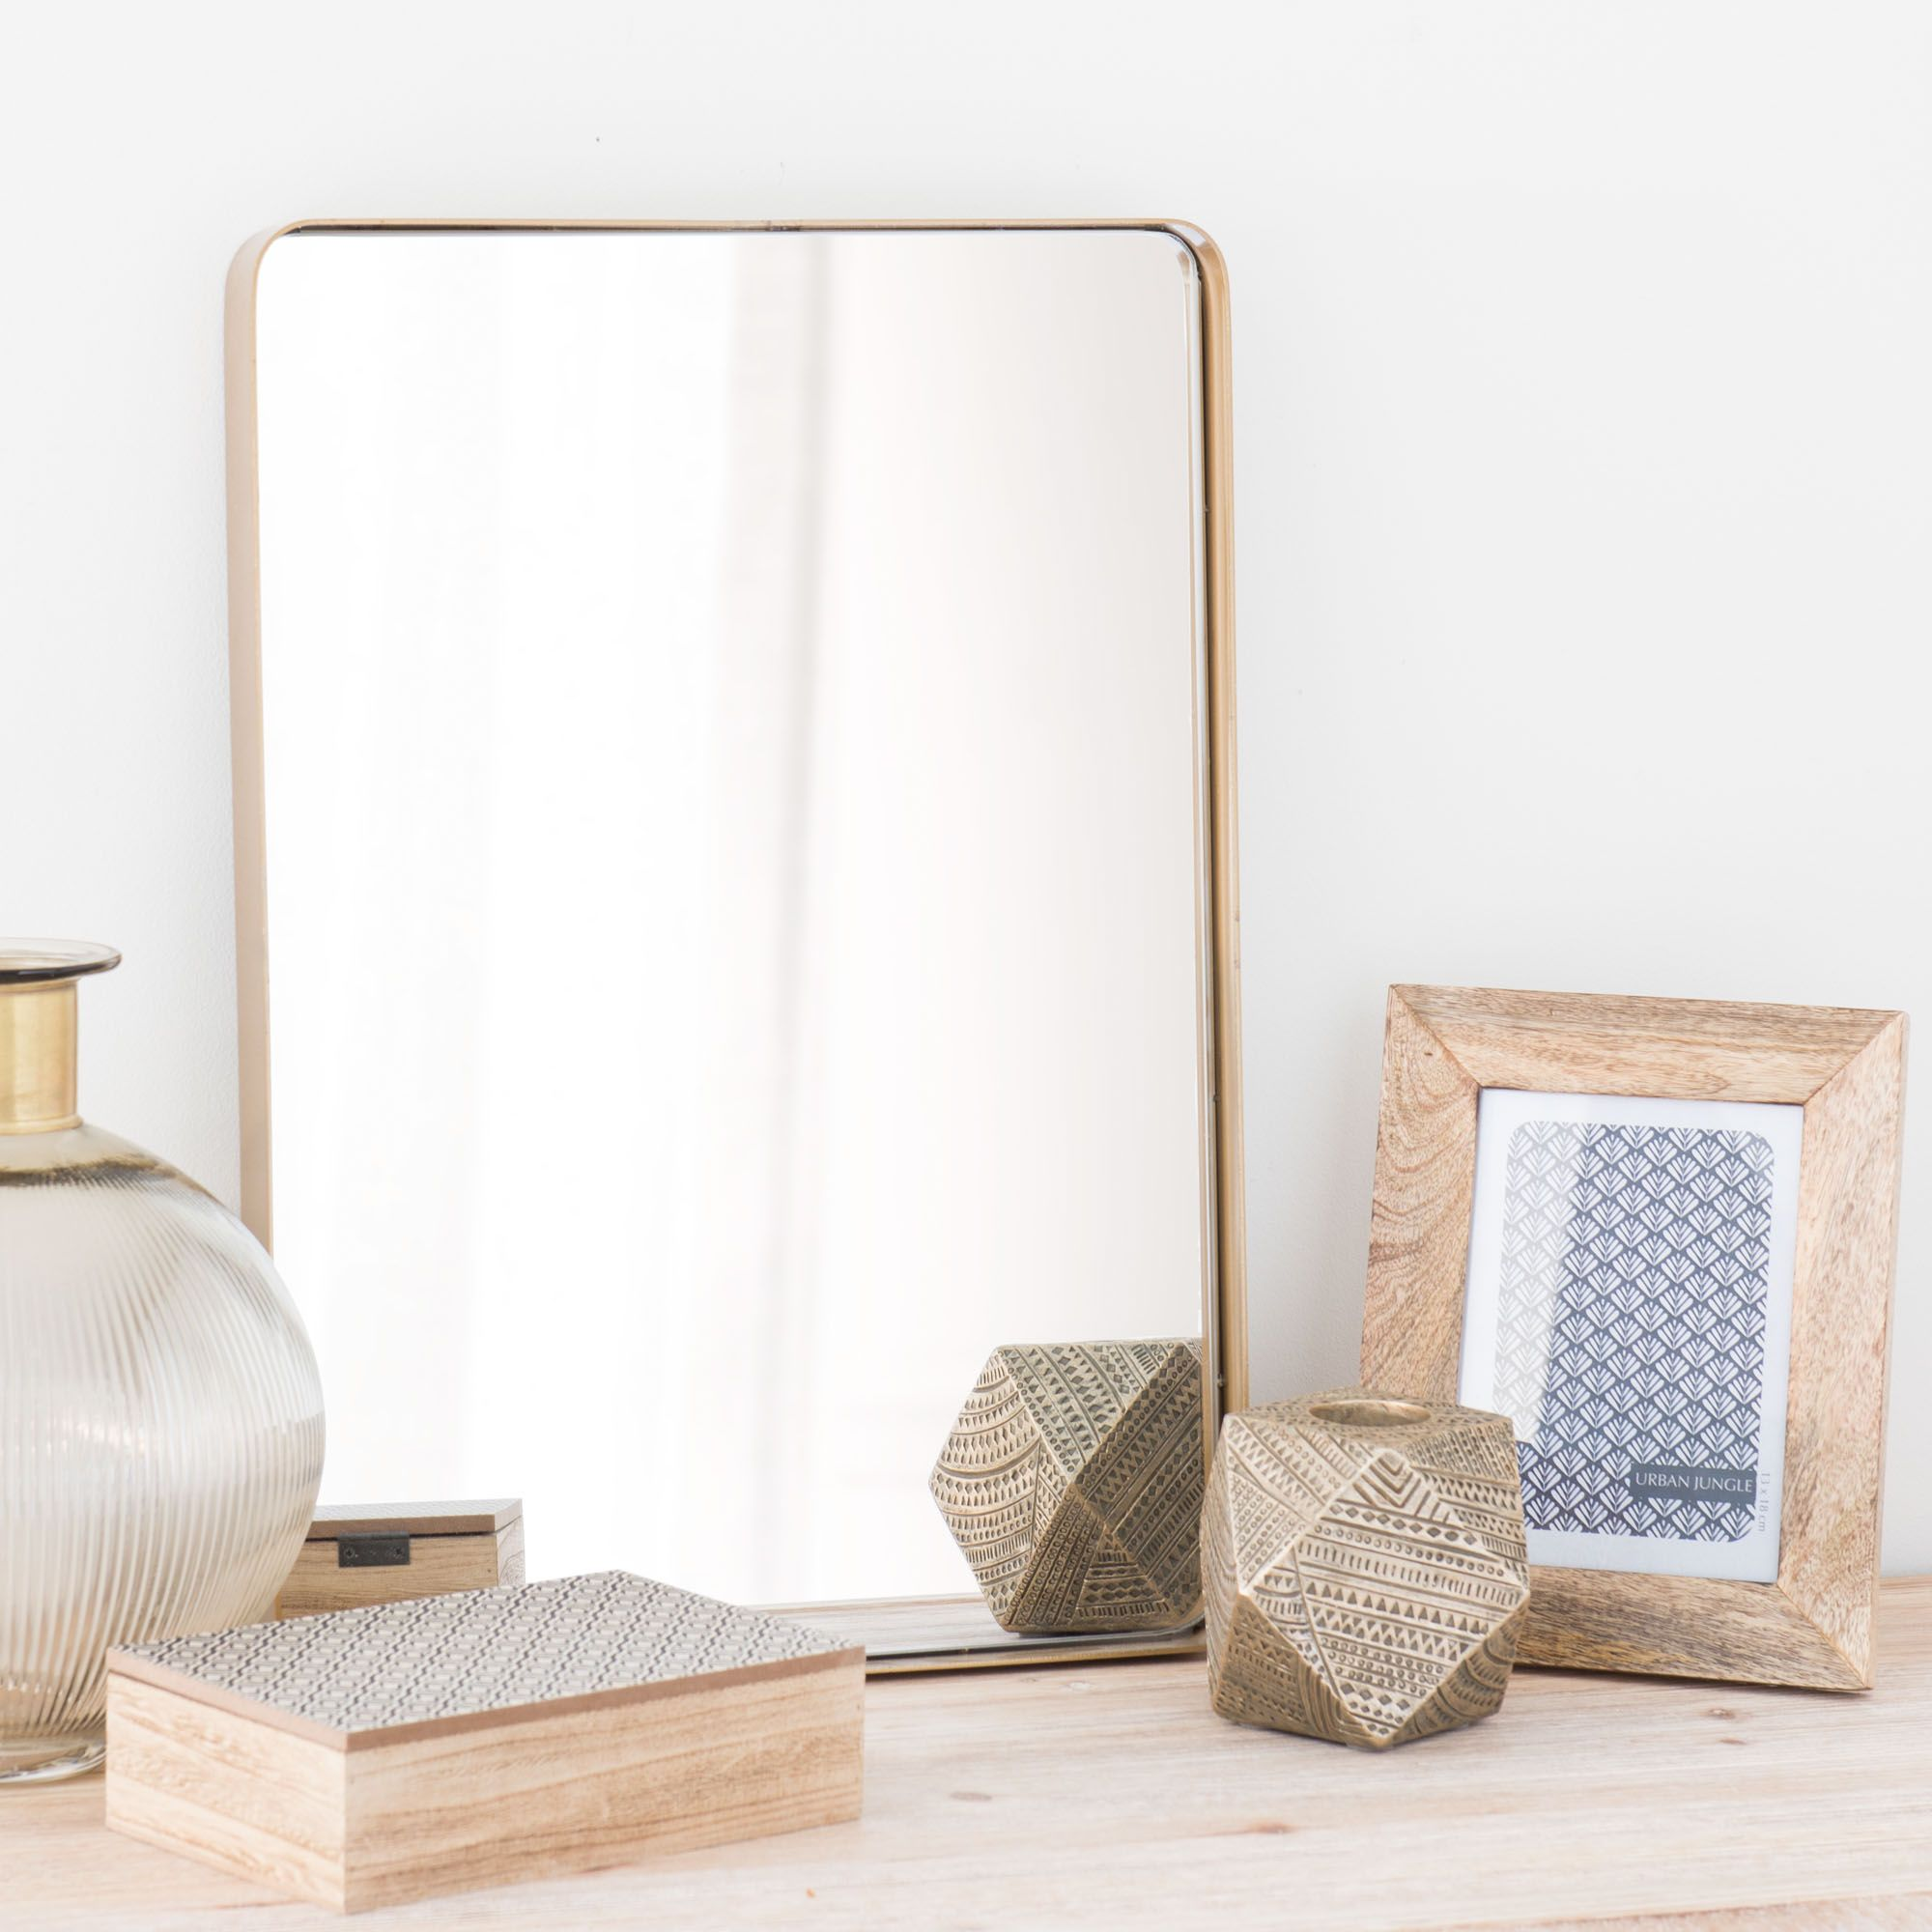 miroir en métal doré h 50 cm ferao | + studio +